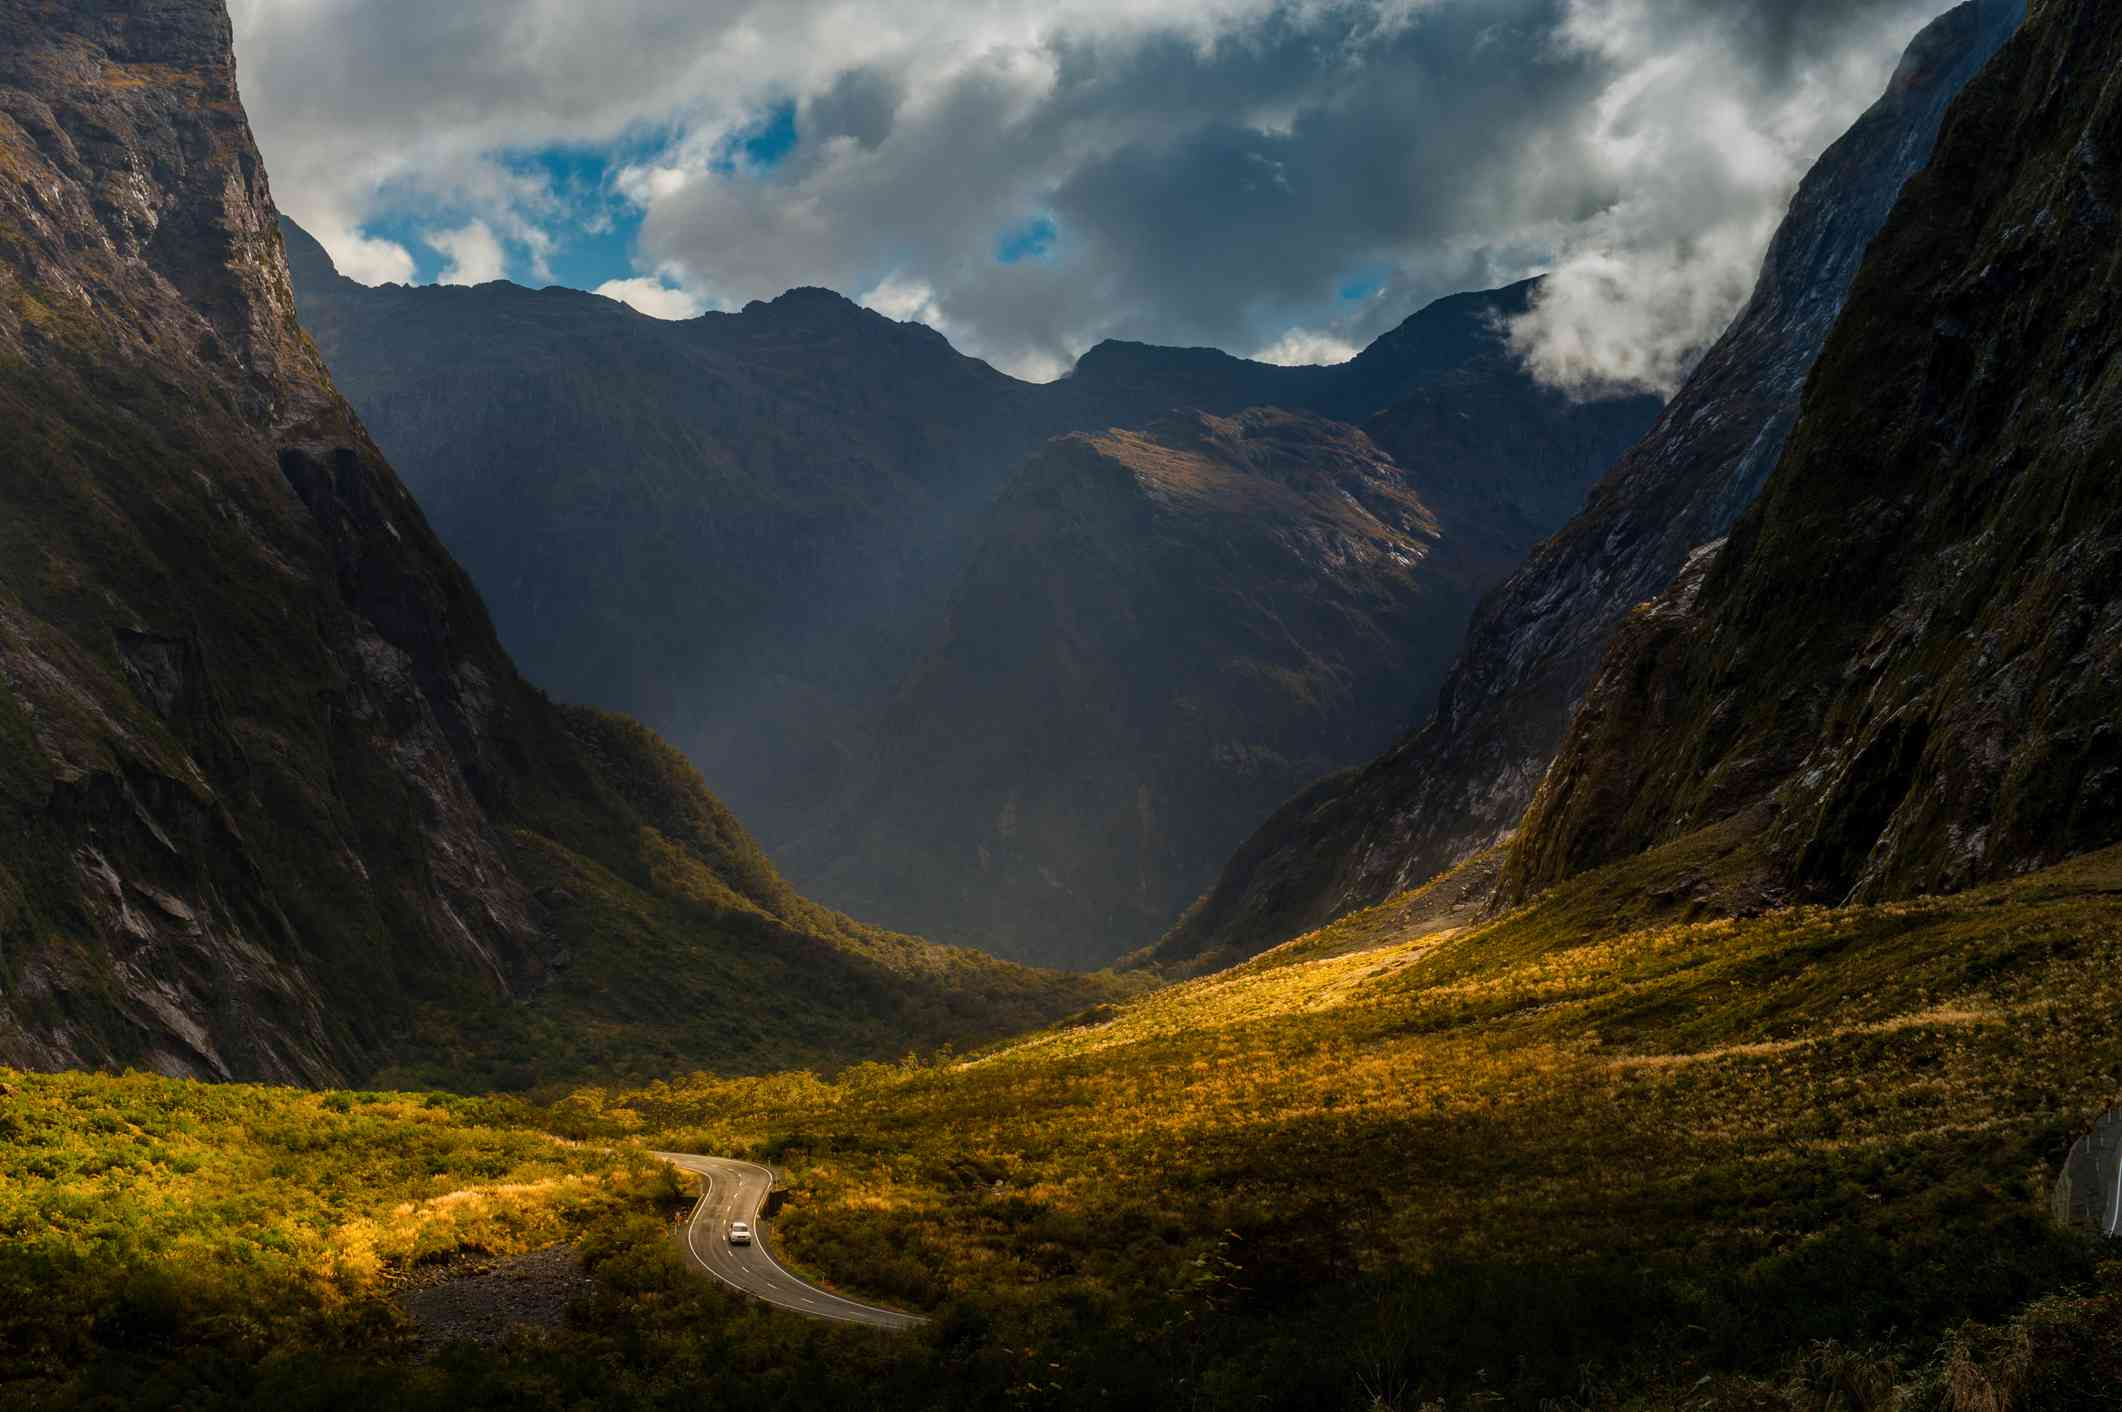 road leading through steep dark mountains